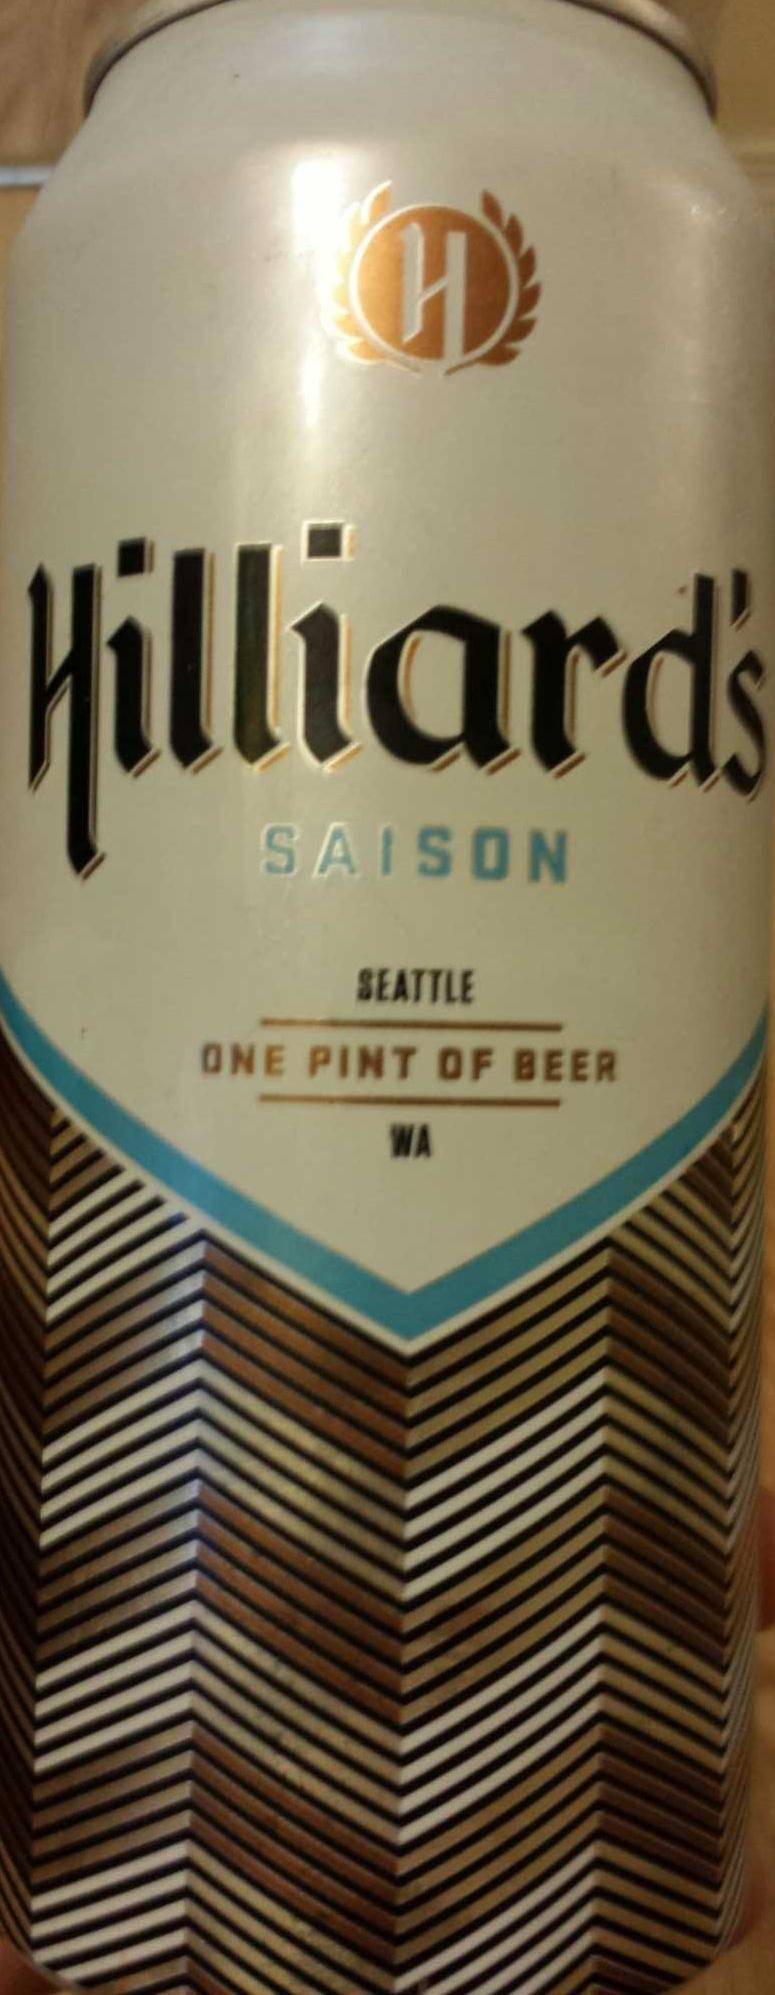 Hilliard's saison - Product